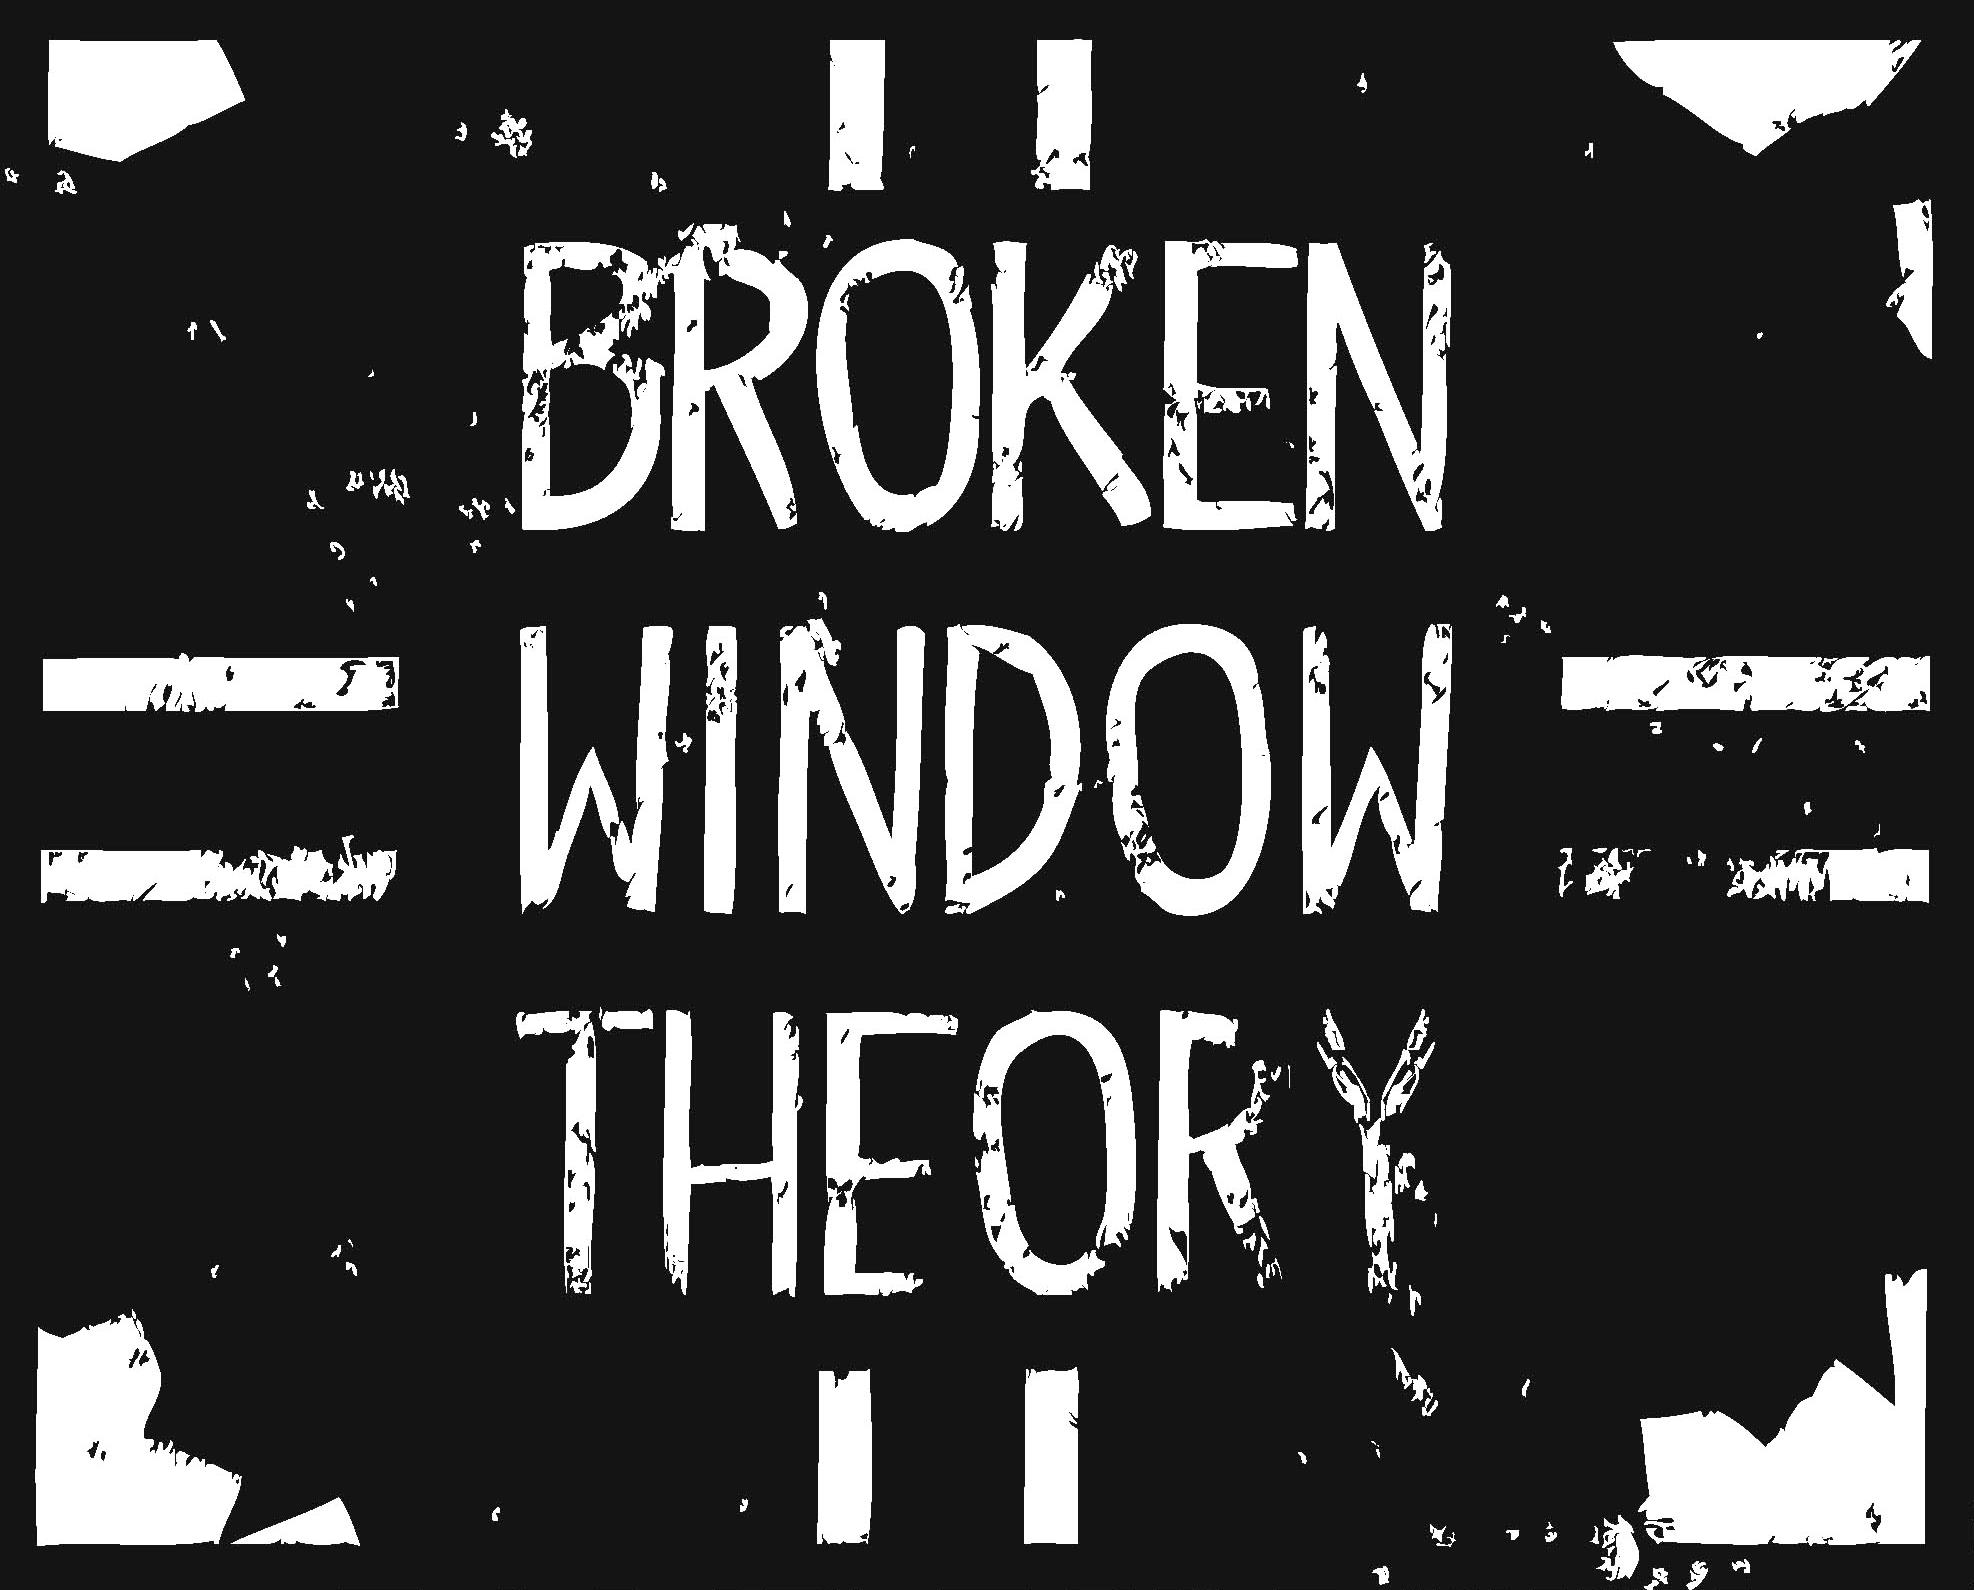 broken window theory essay